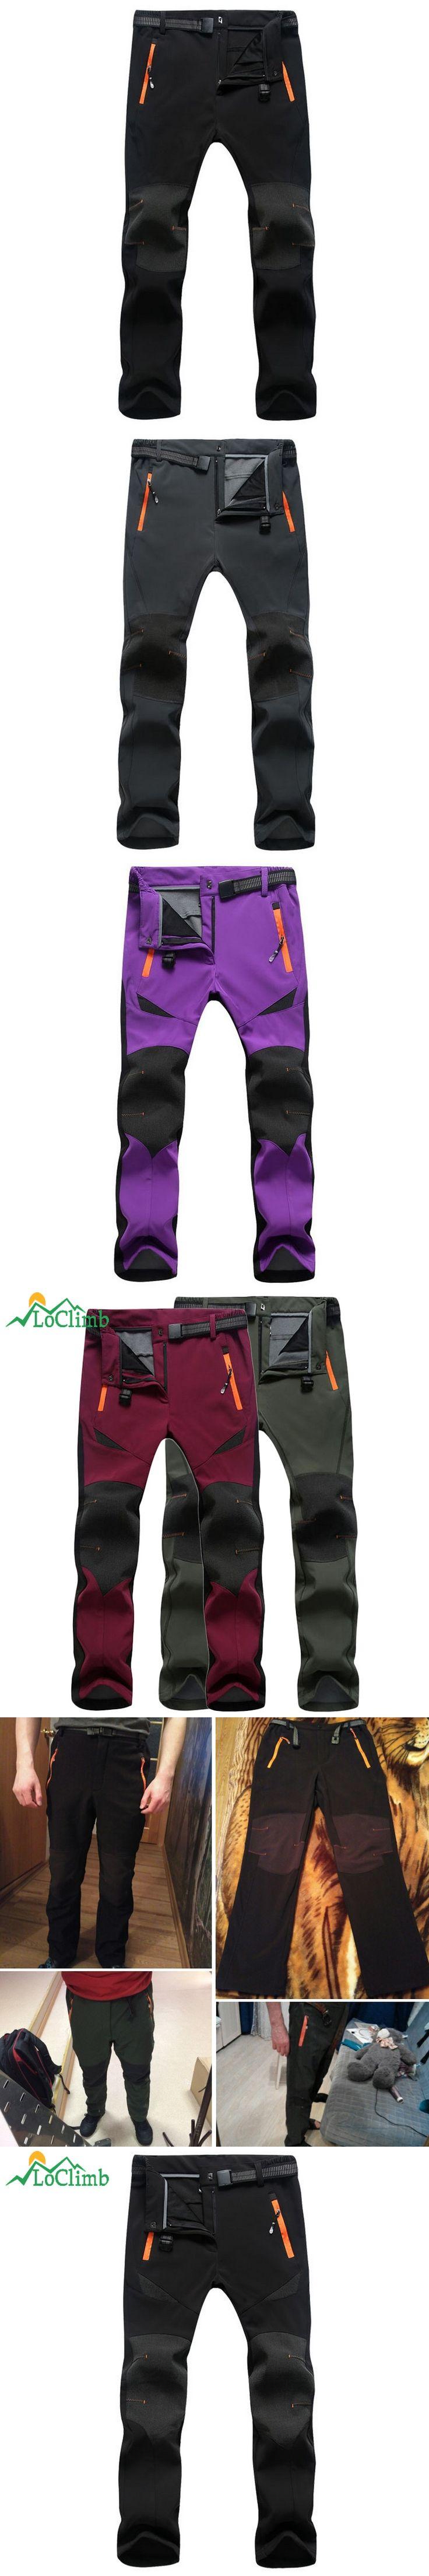 LoClimb 2017 Winter Stretch Waterproof Ski Pants Women Men Trekking Climbing Trousers Outdoor Sport Softshell Hiking Pants,AM108